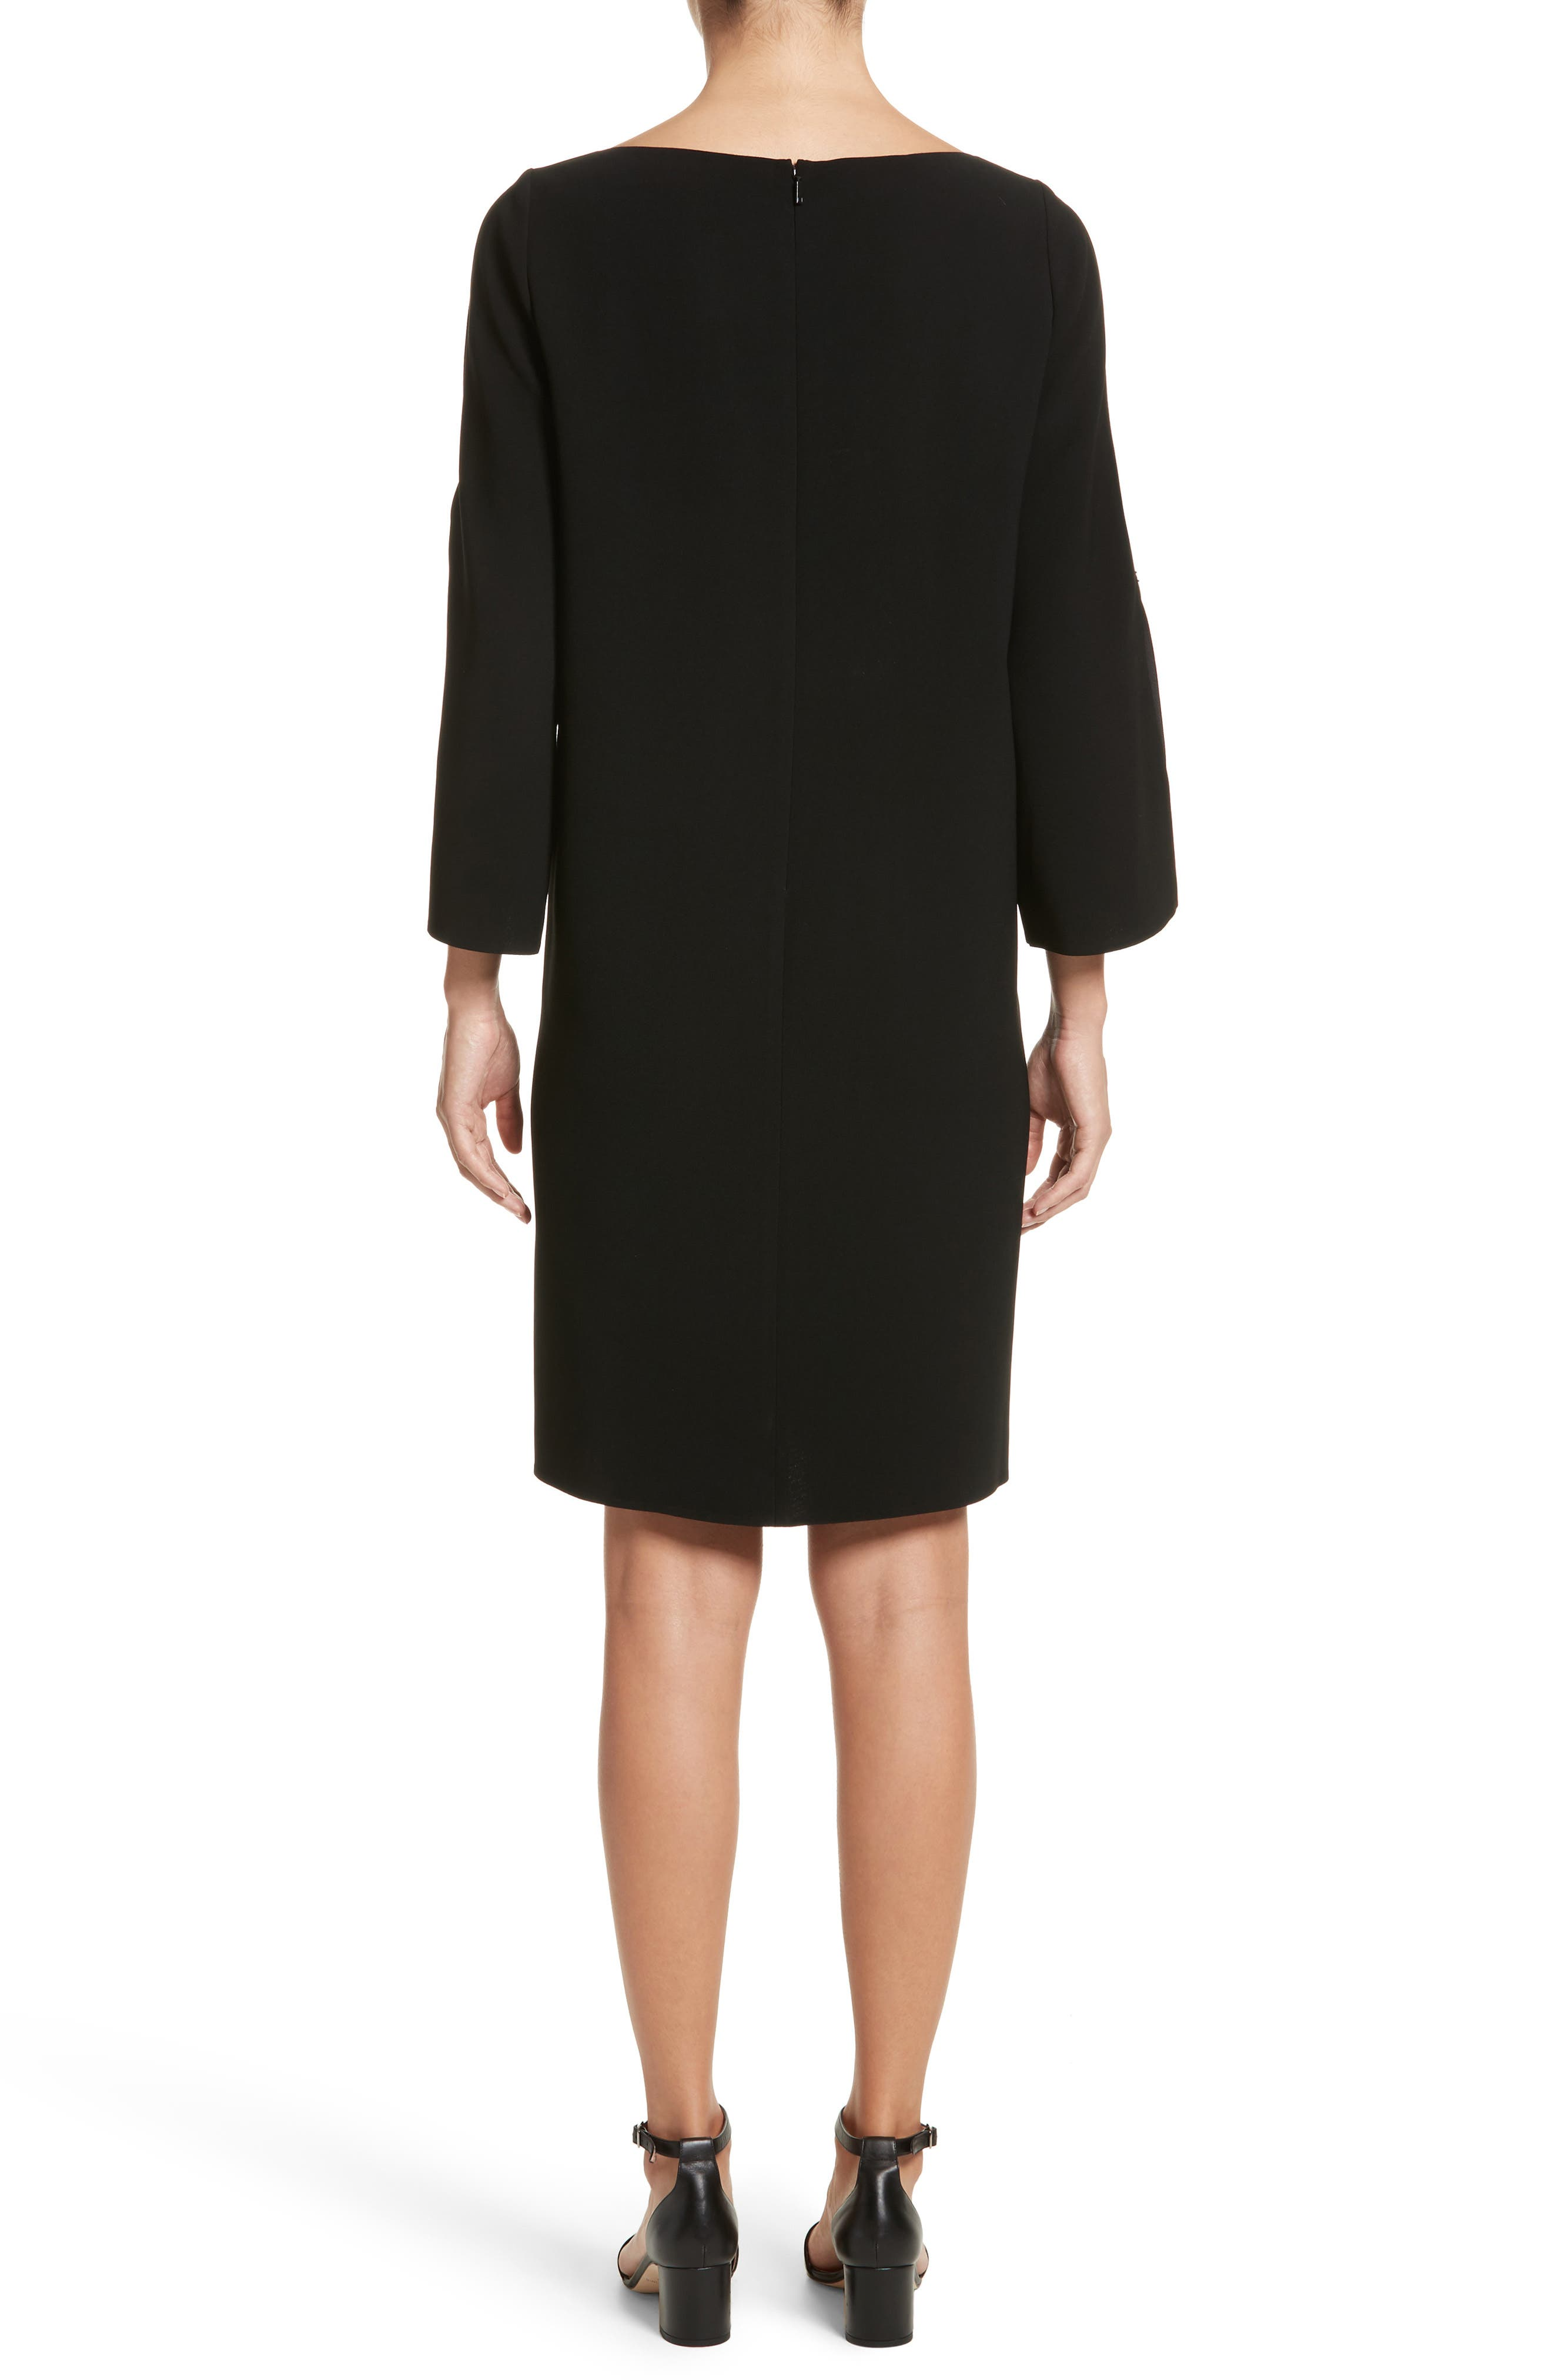 Candace Finesse Crepe Shift Dress,                             Alternate thumbnail 2, color,                             Black